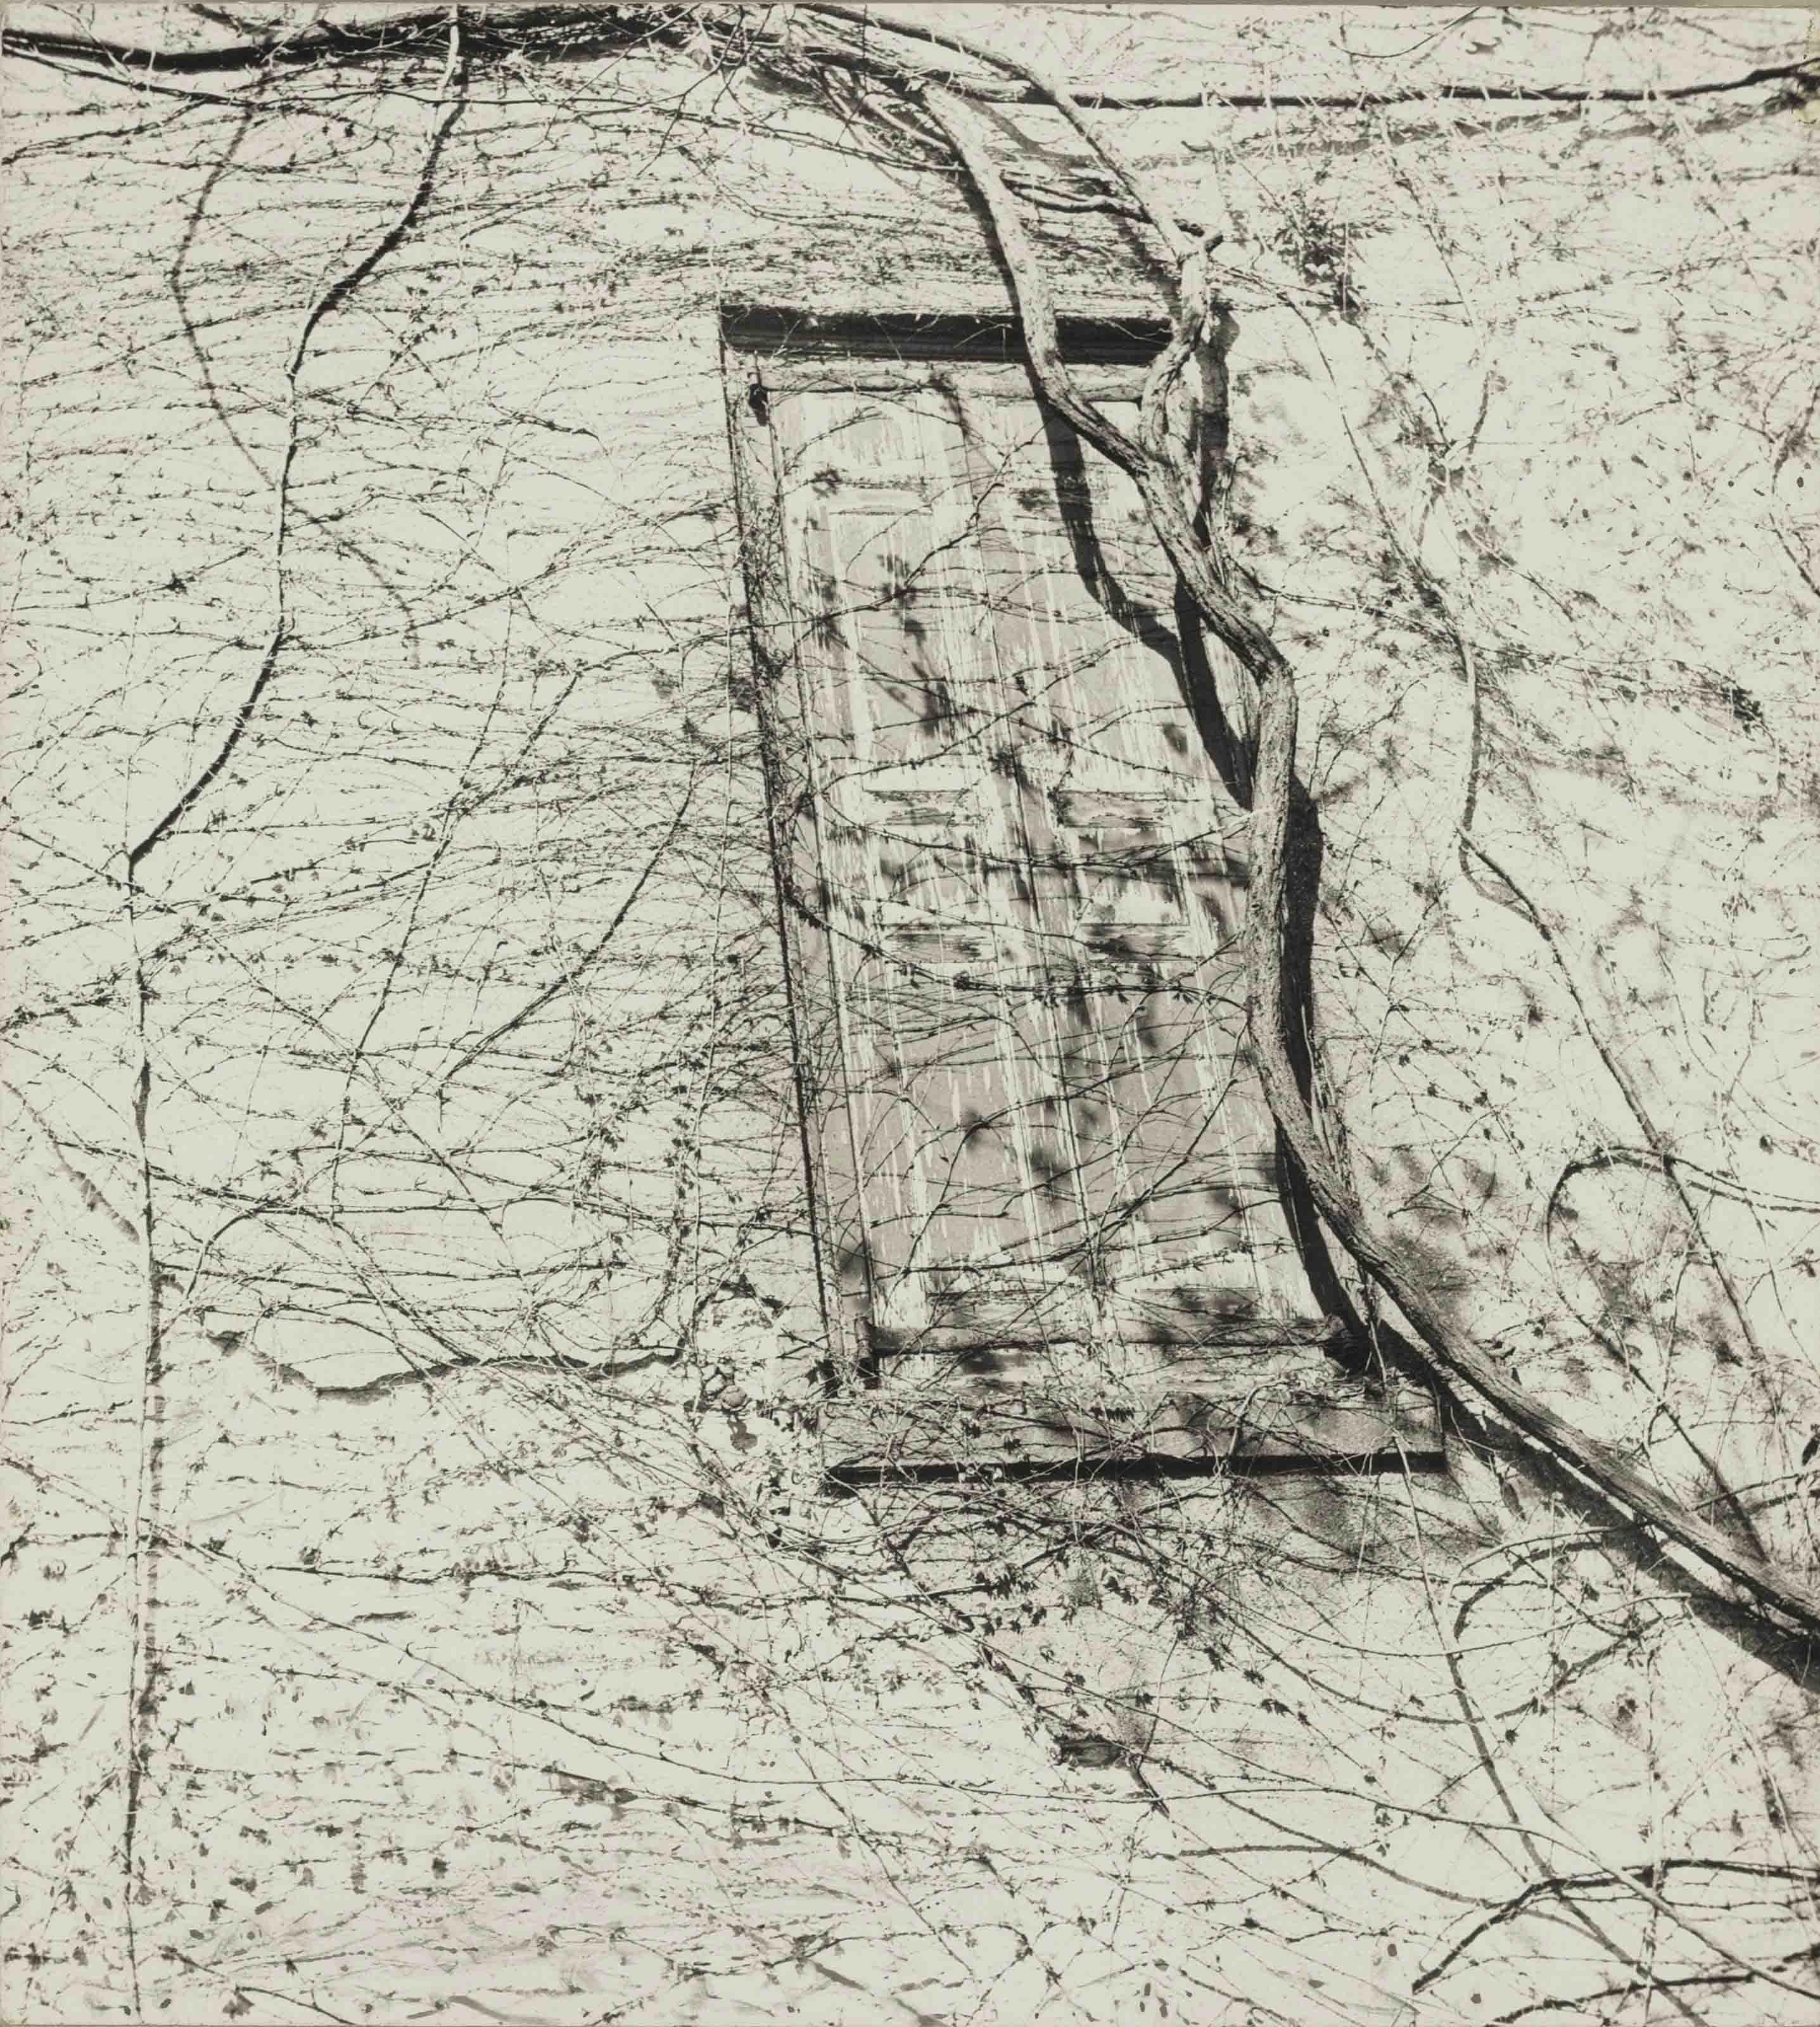 Untitled, c. 1938